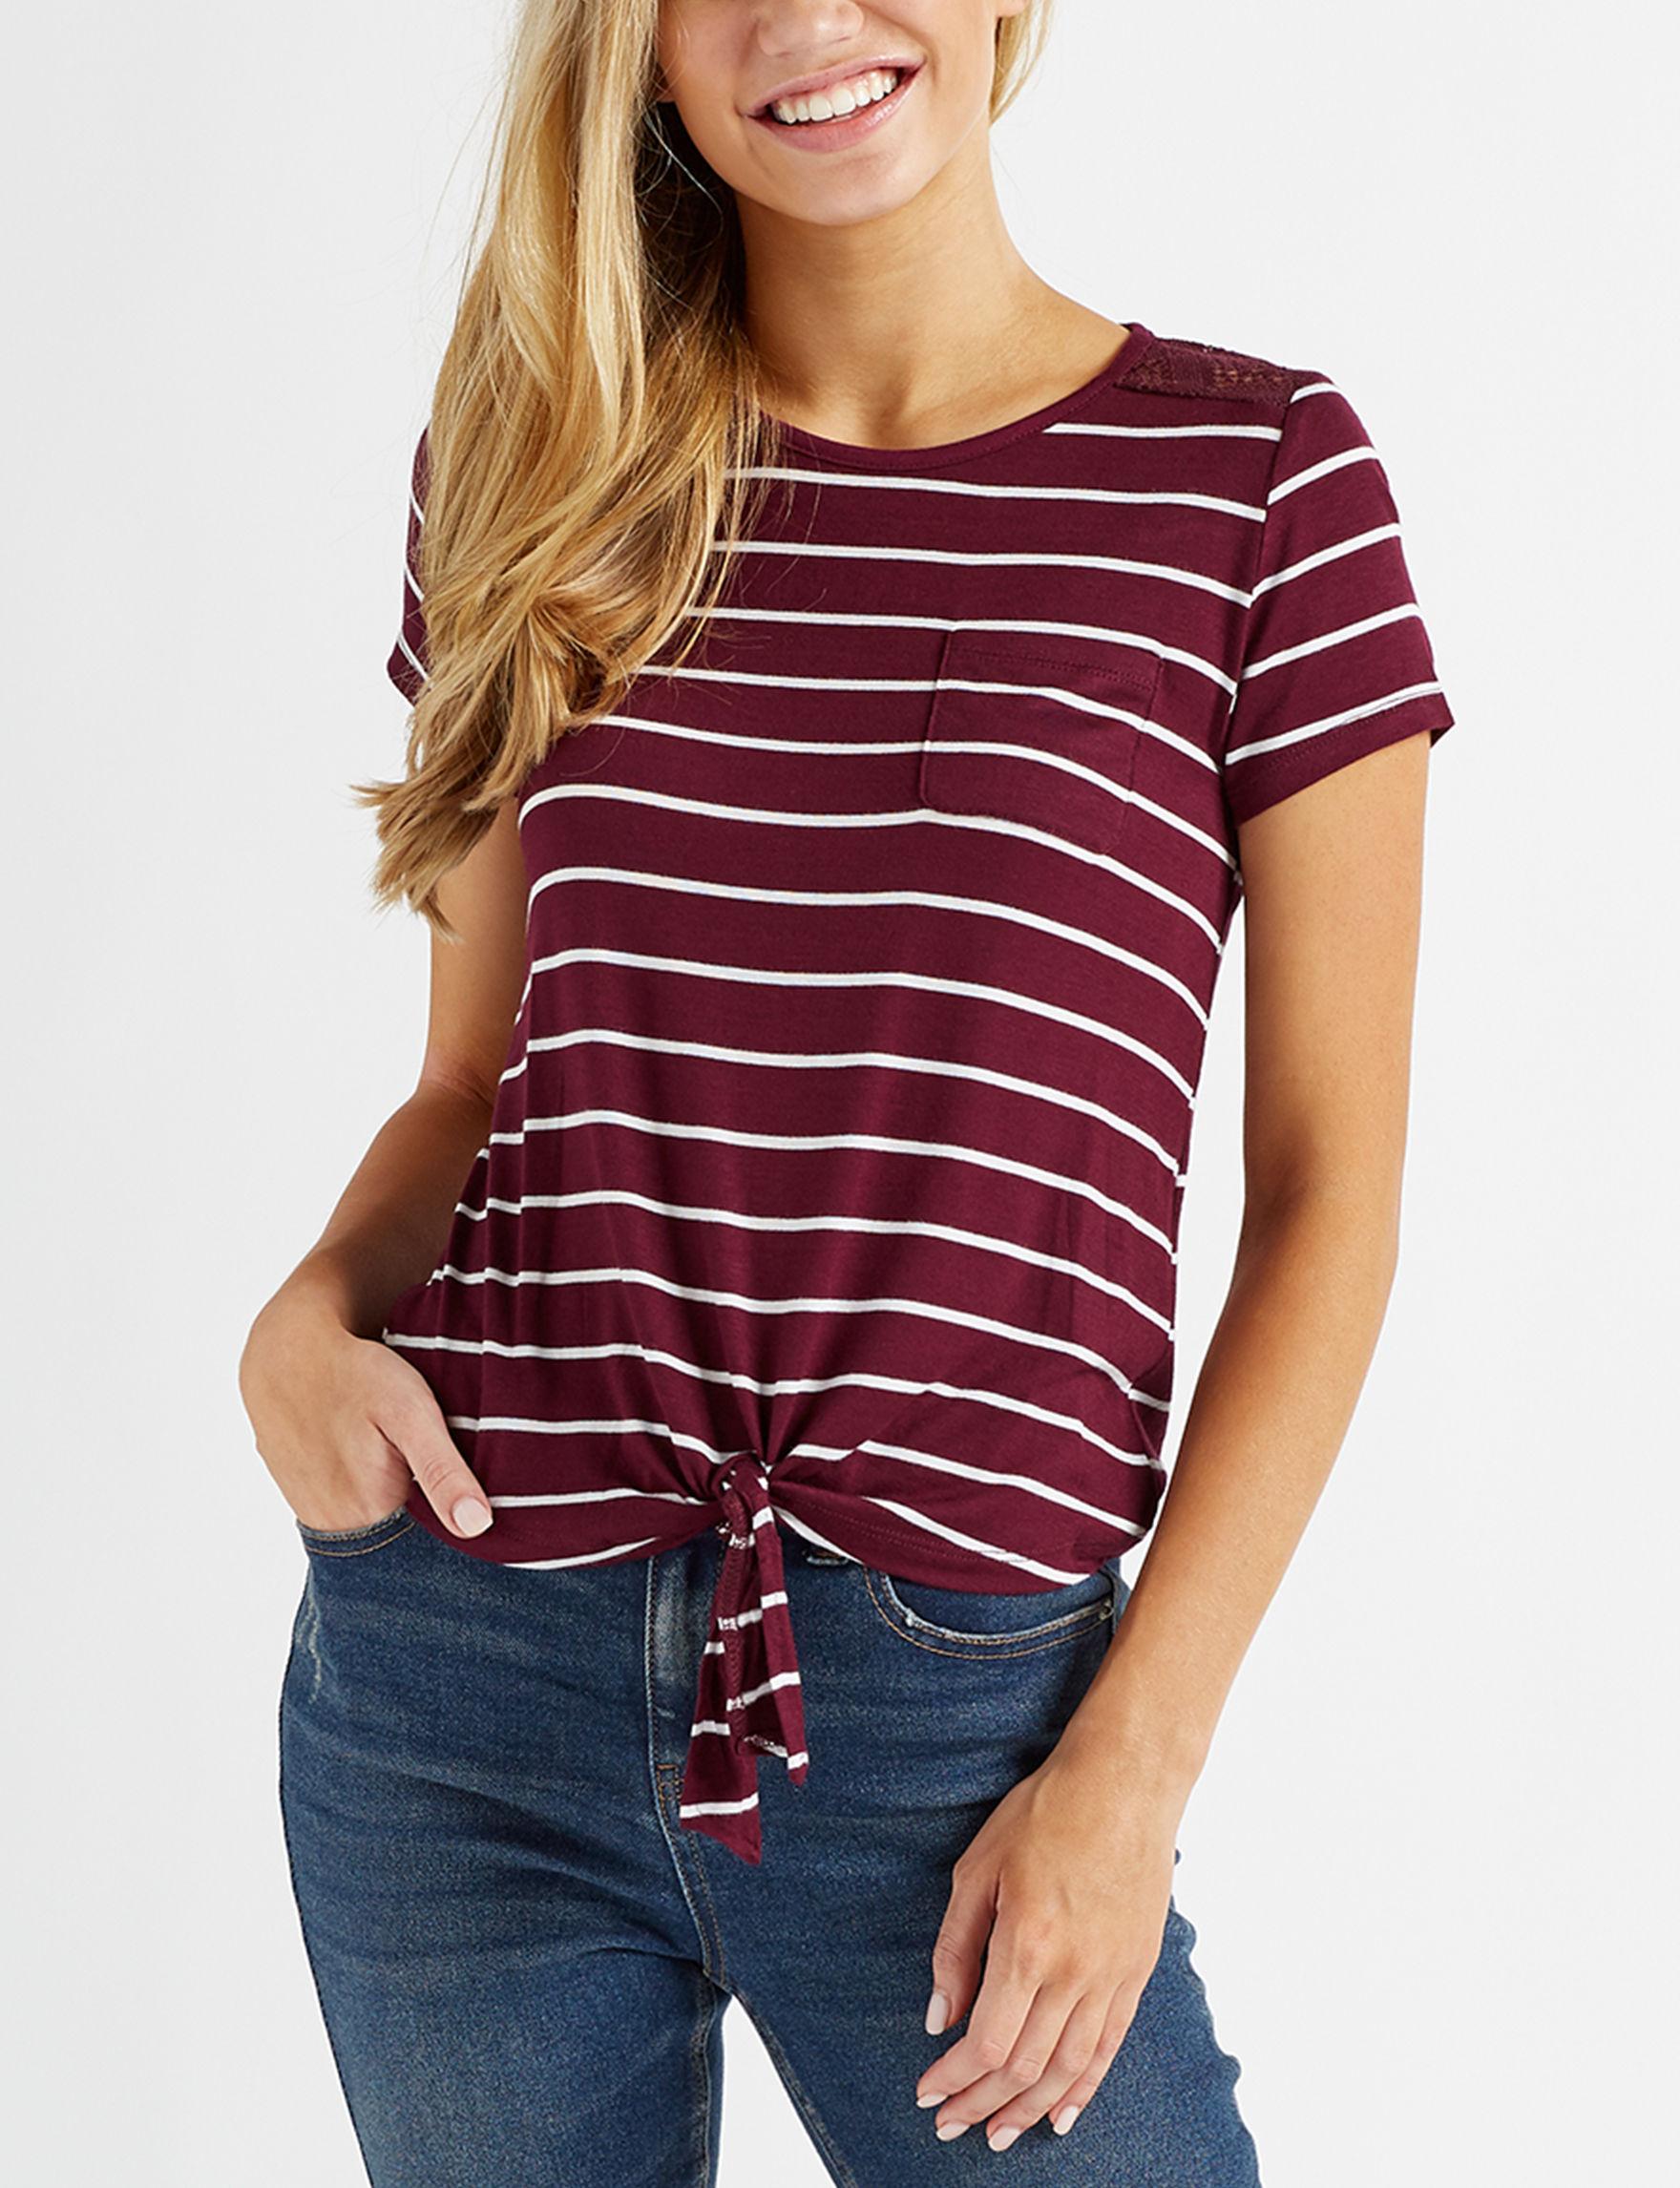 Glitz Burgundy Shirts & Blouses